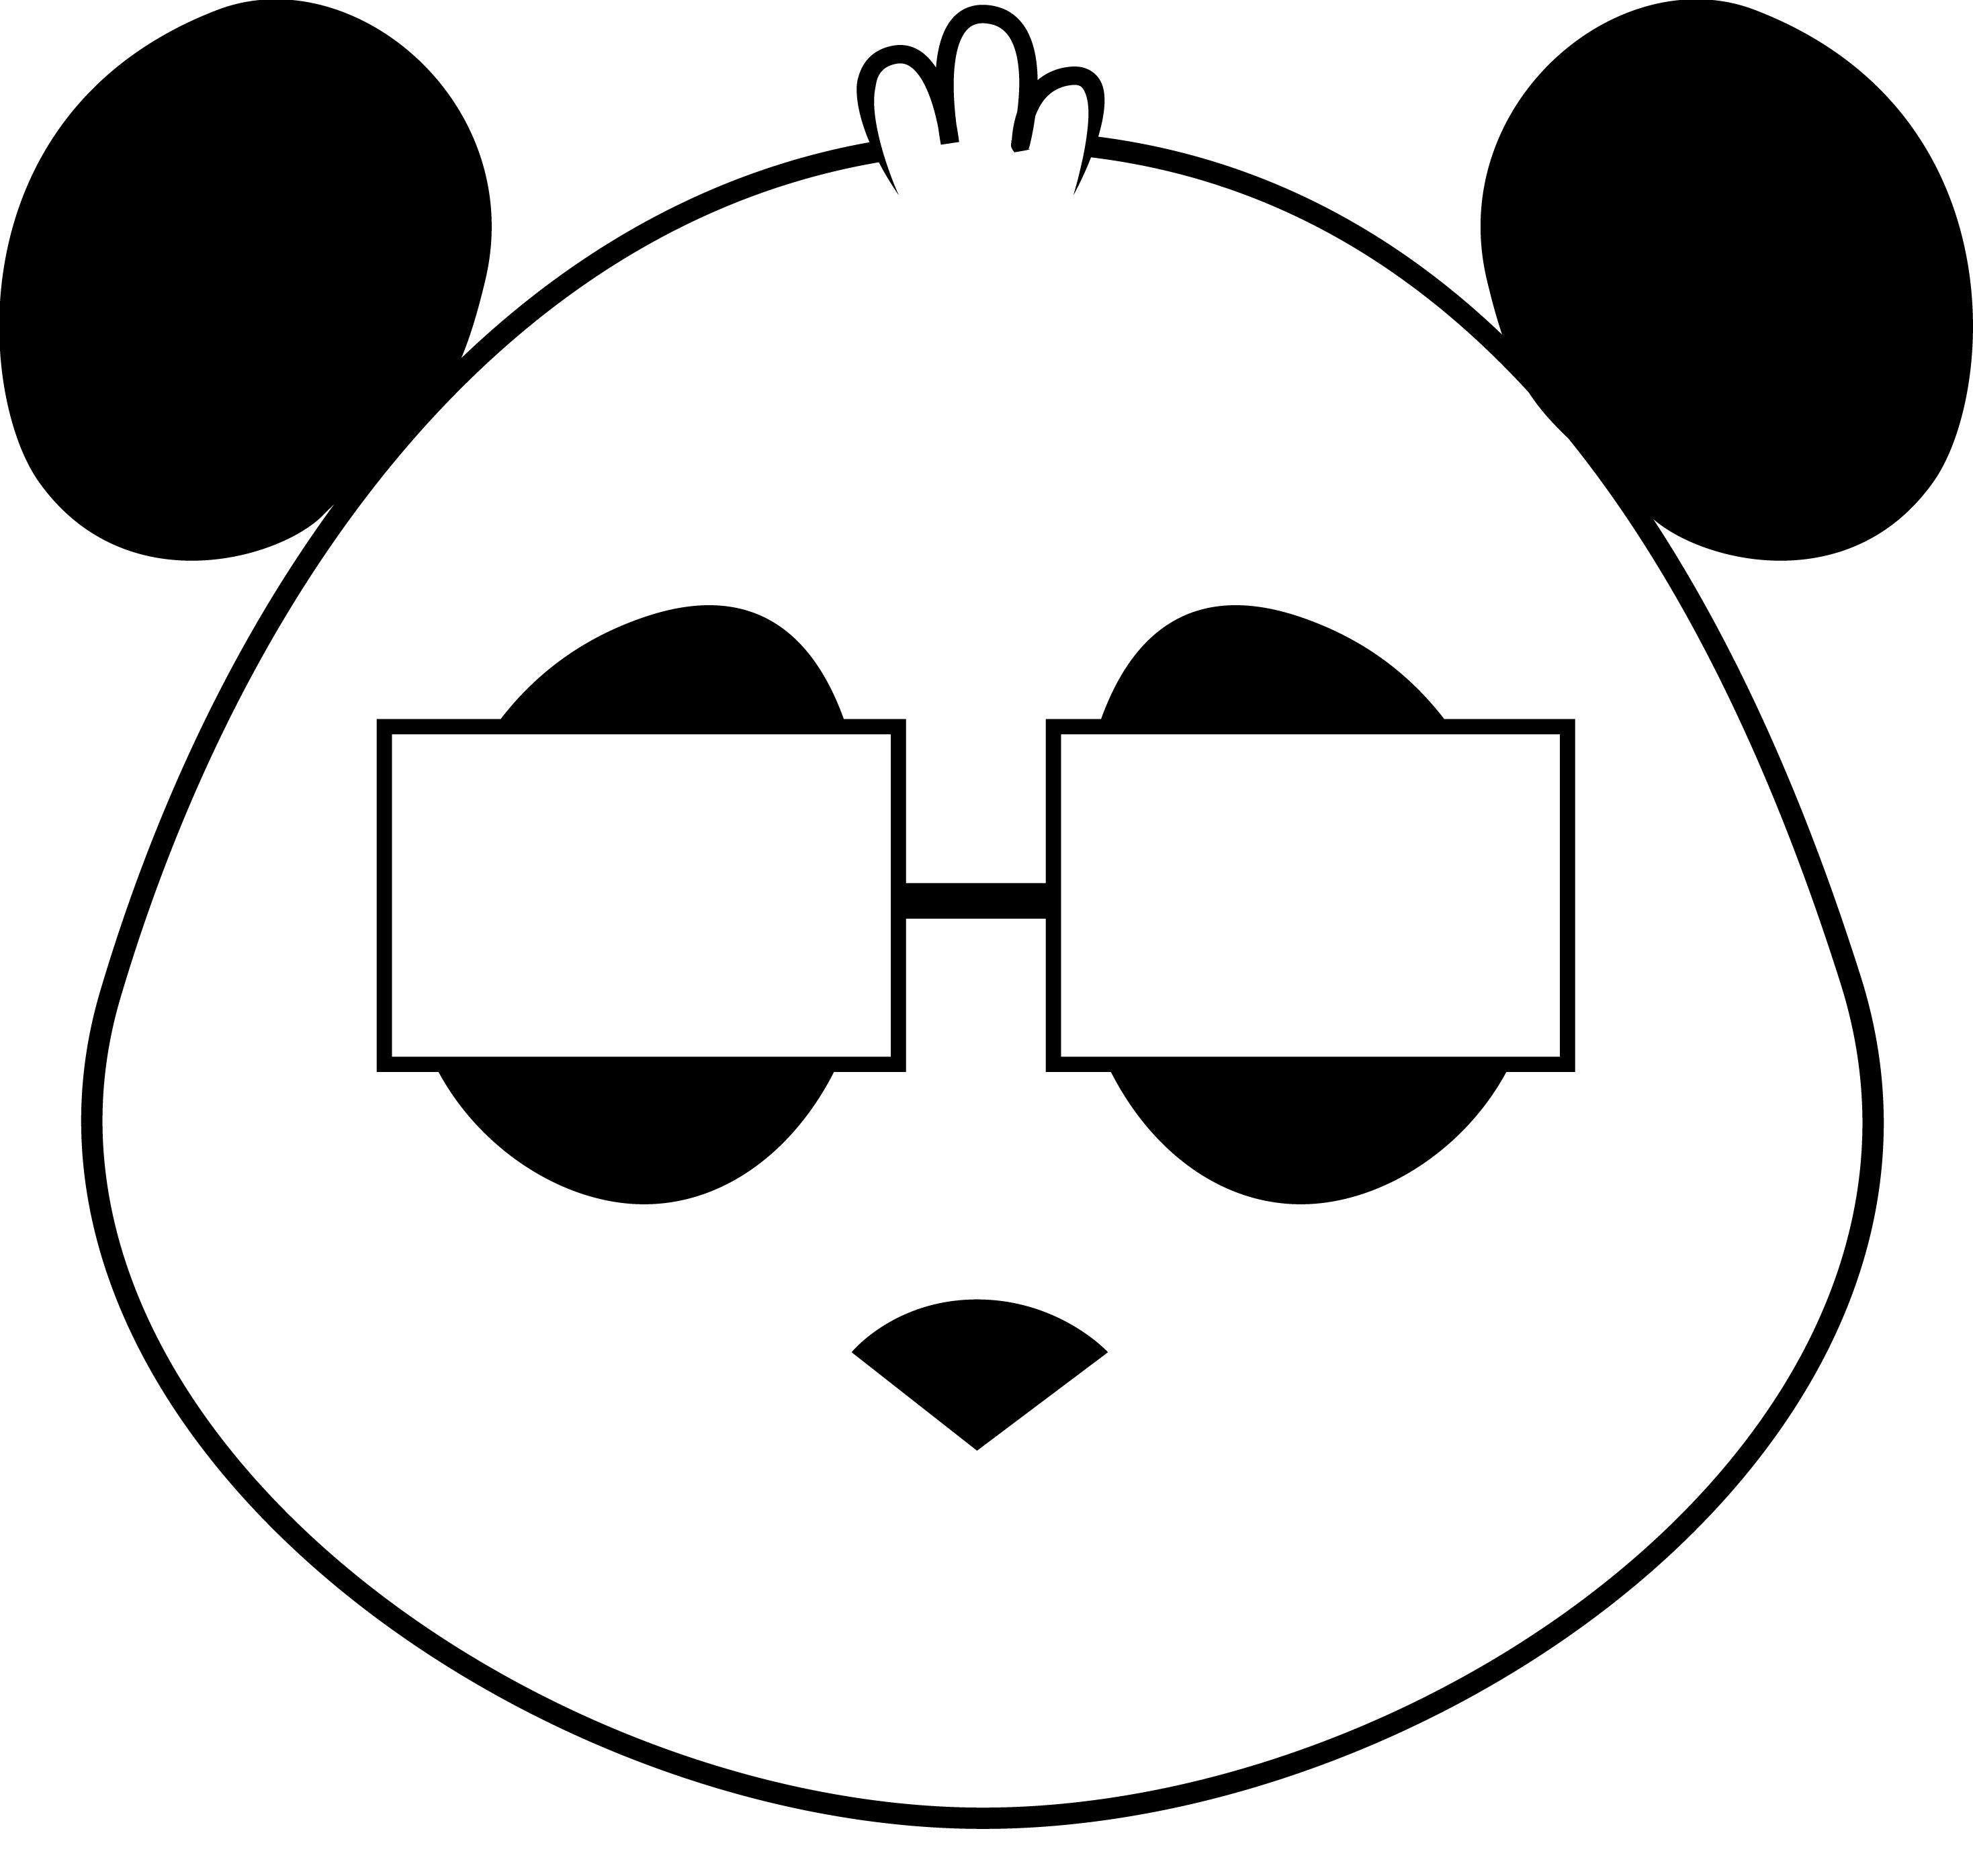 peoplecode encrypt u0026 decrypt values the smart panda